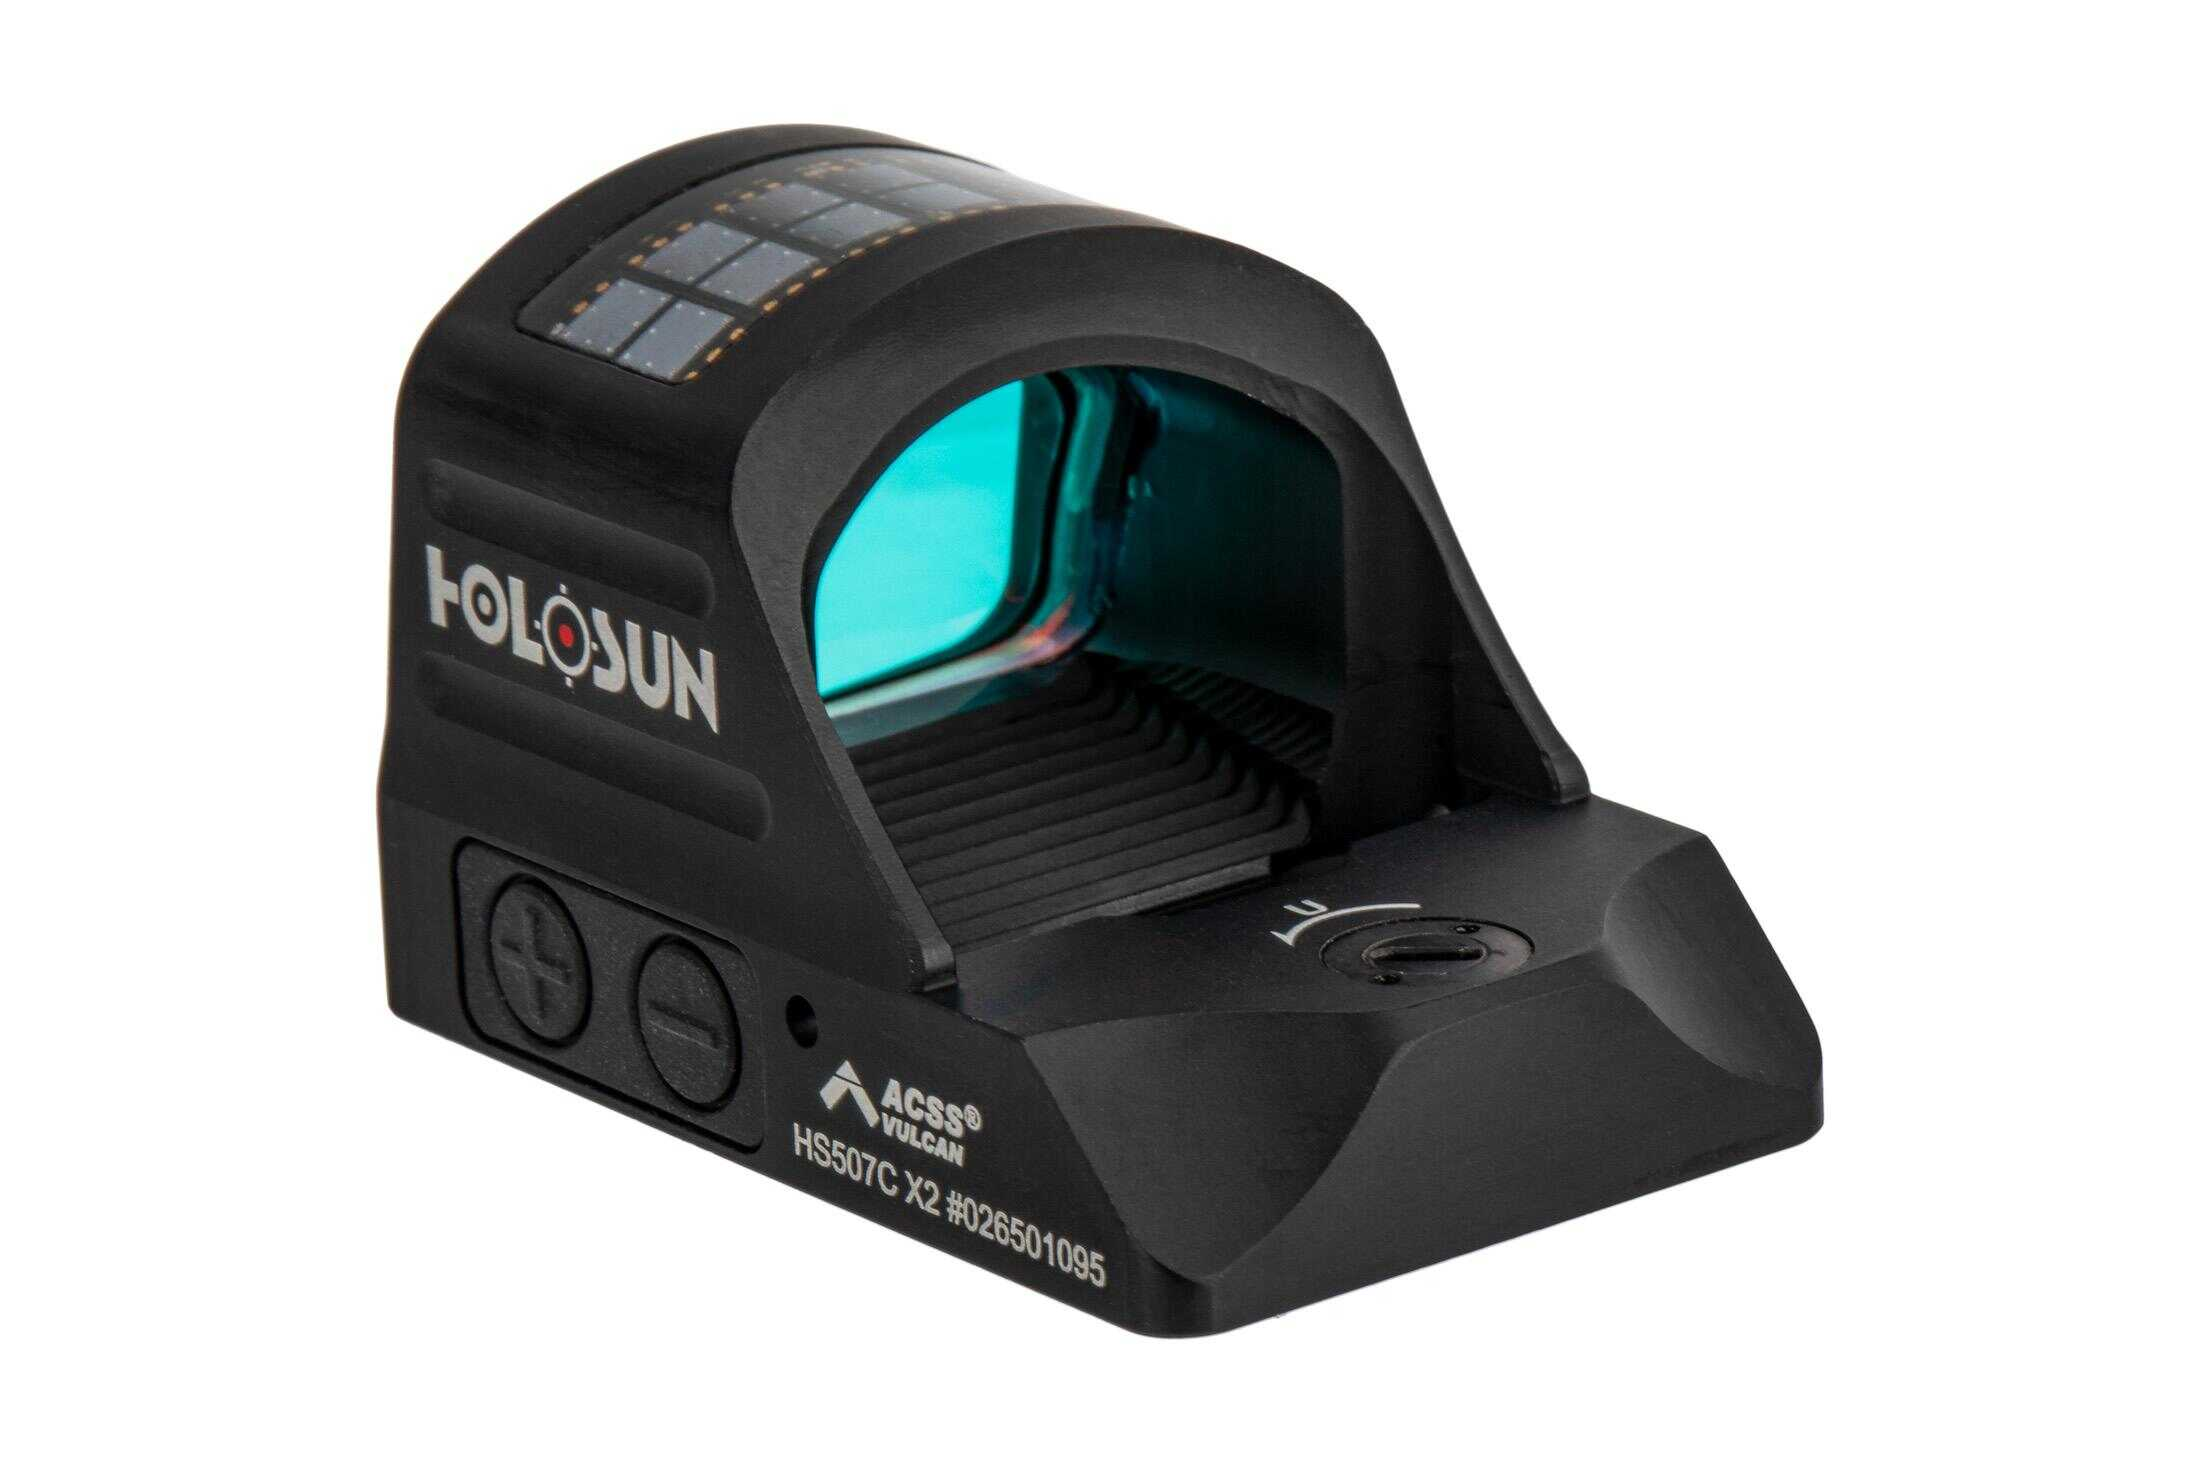 HS507C-X2 Pistol Red Dot Sight - ACSS® Vulcan™ Reticle